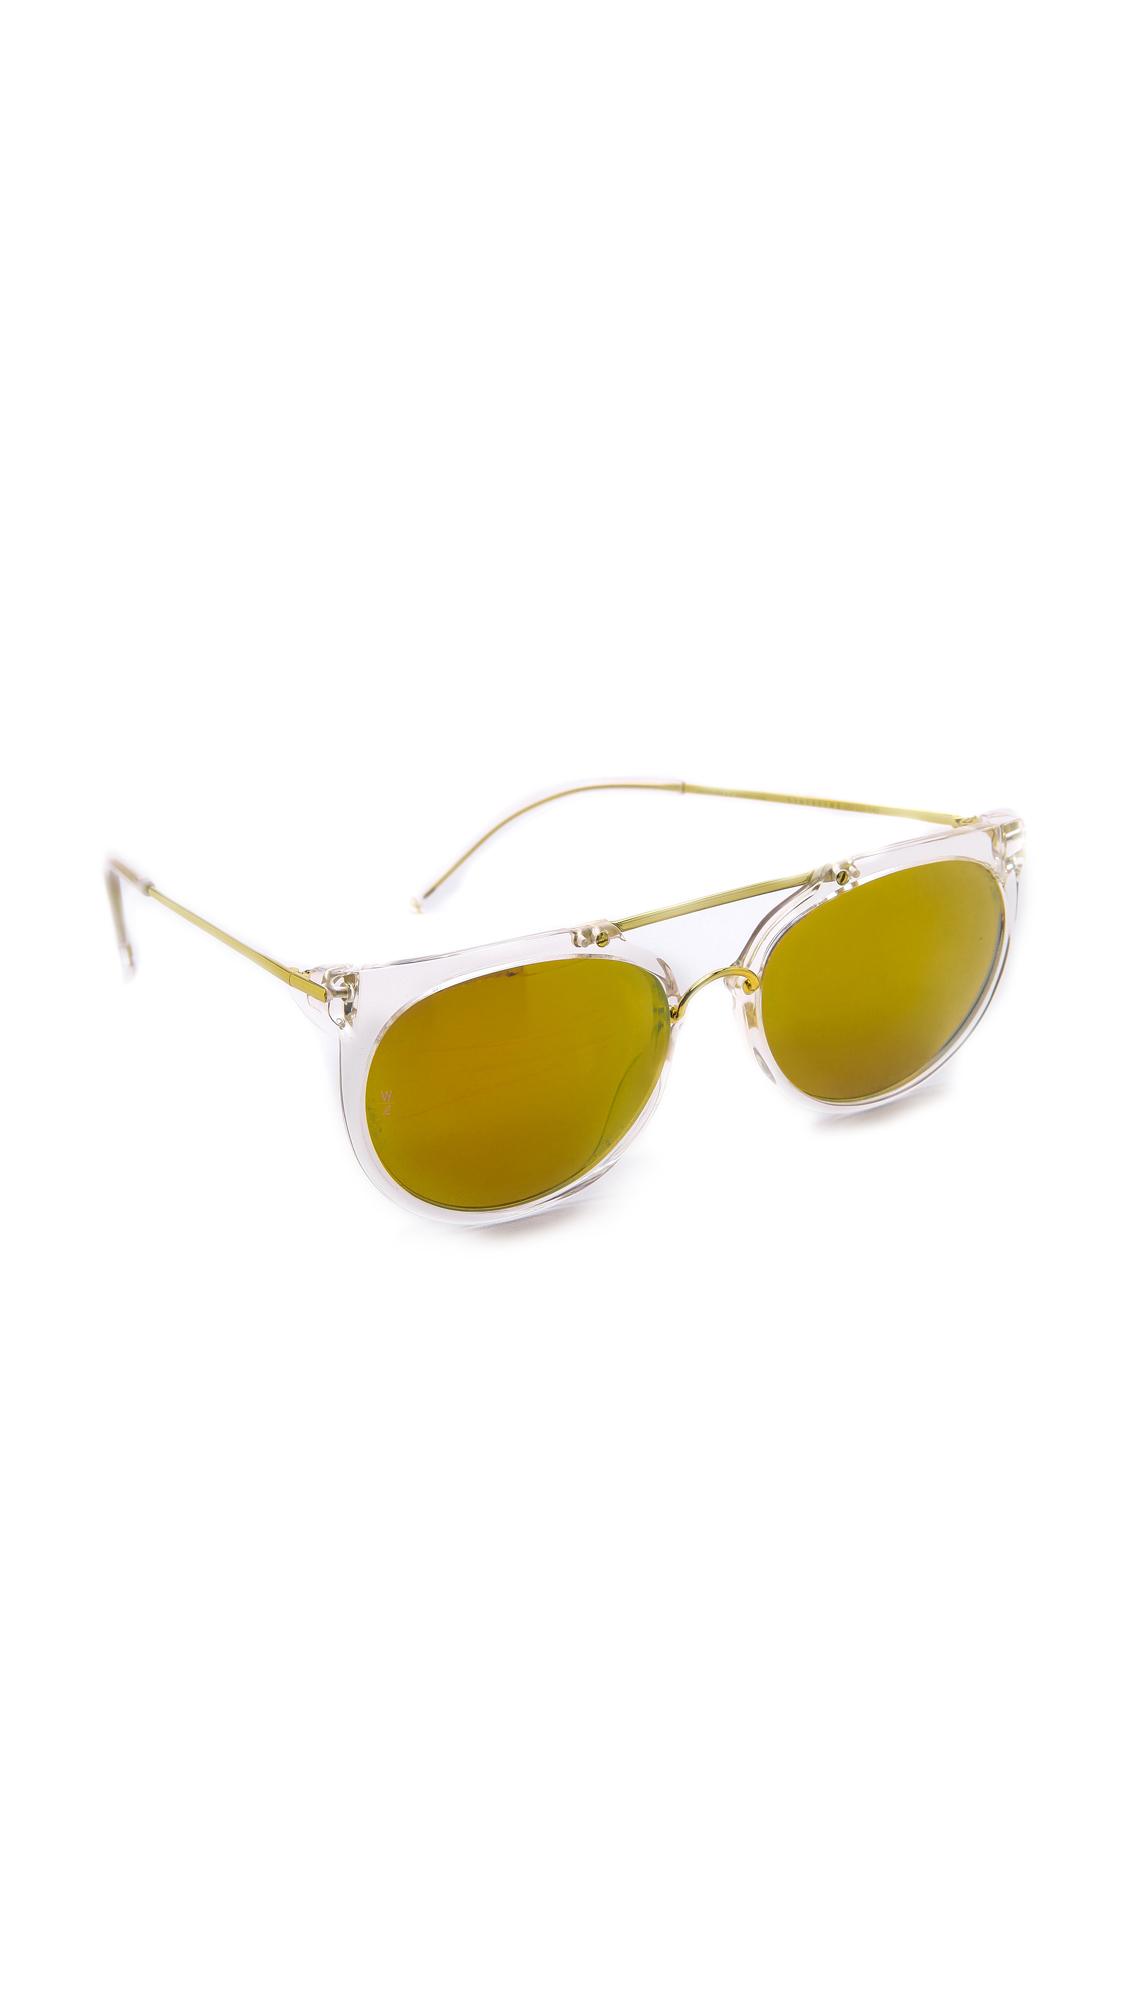 683d7539a3 Wonderland Stateline Sunglasses - Clear gold in Metallic - Lyst